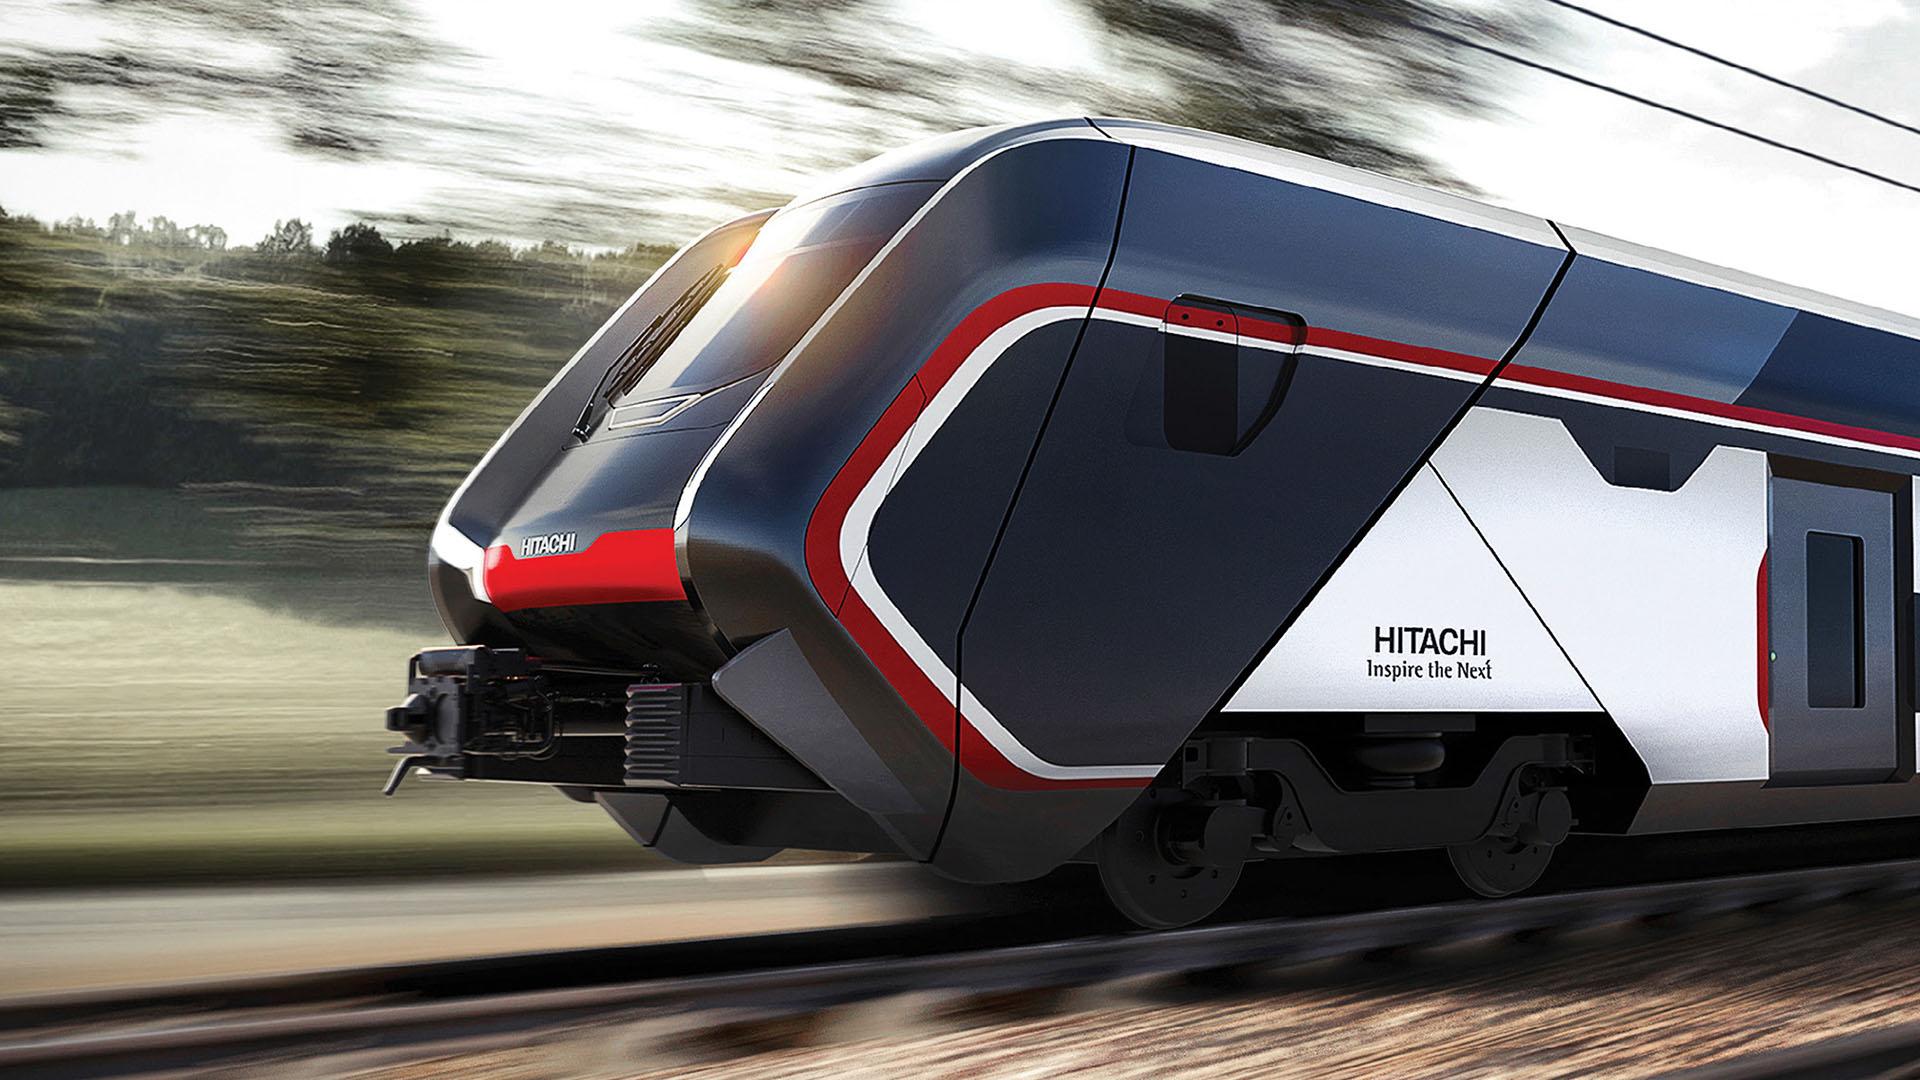 resintex_0001_Hitachi Rail Italy-Caravaggio_hq_2